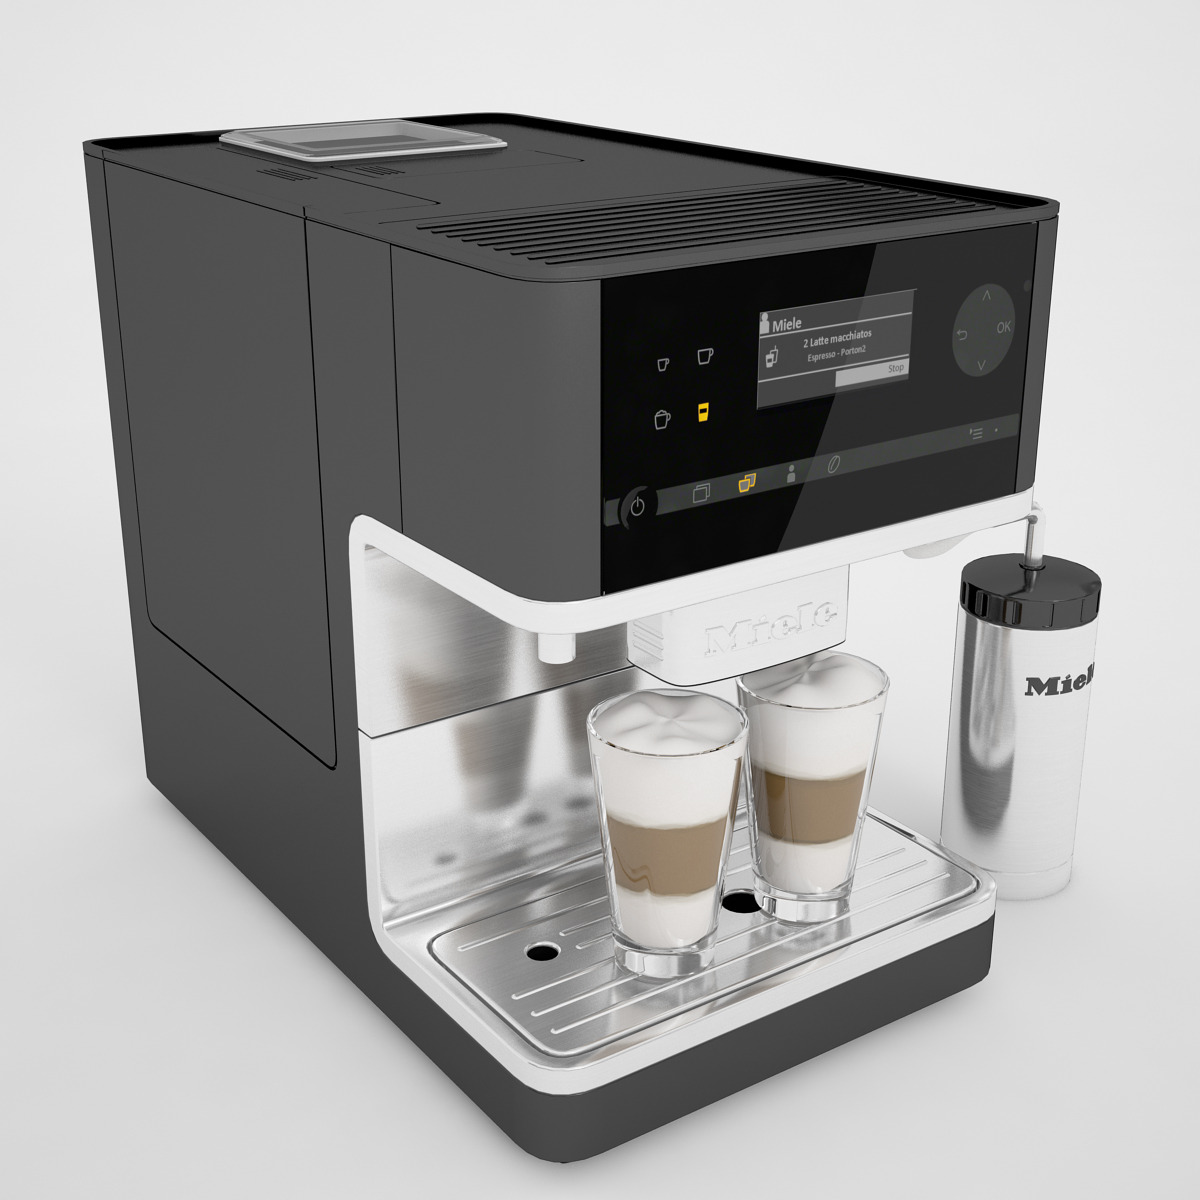 Miele Cm6300 Coffee Machine By Genkot29 3docean